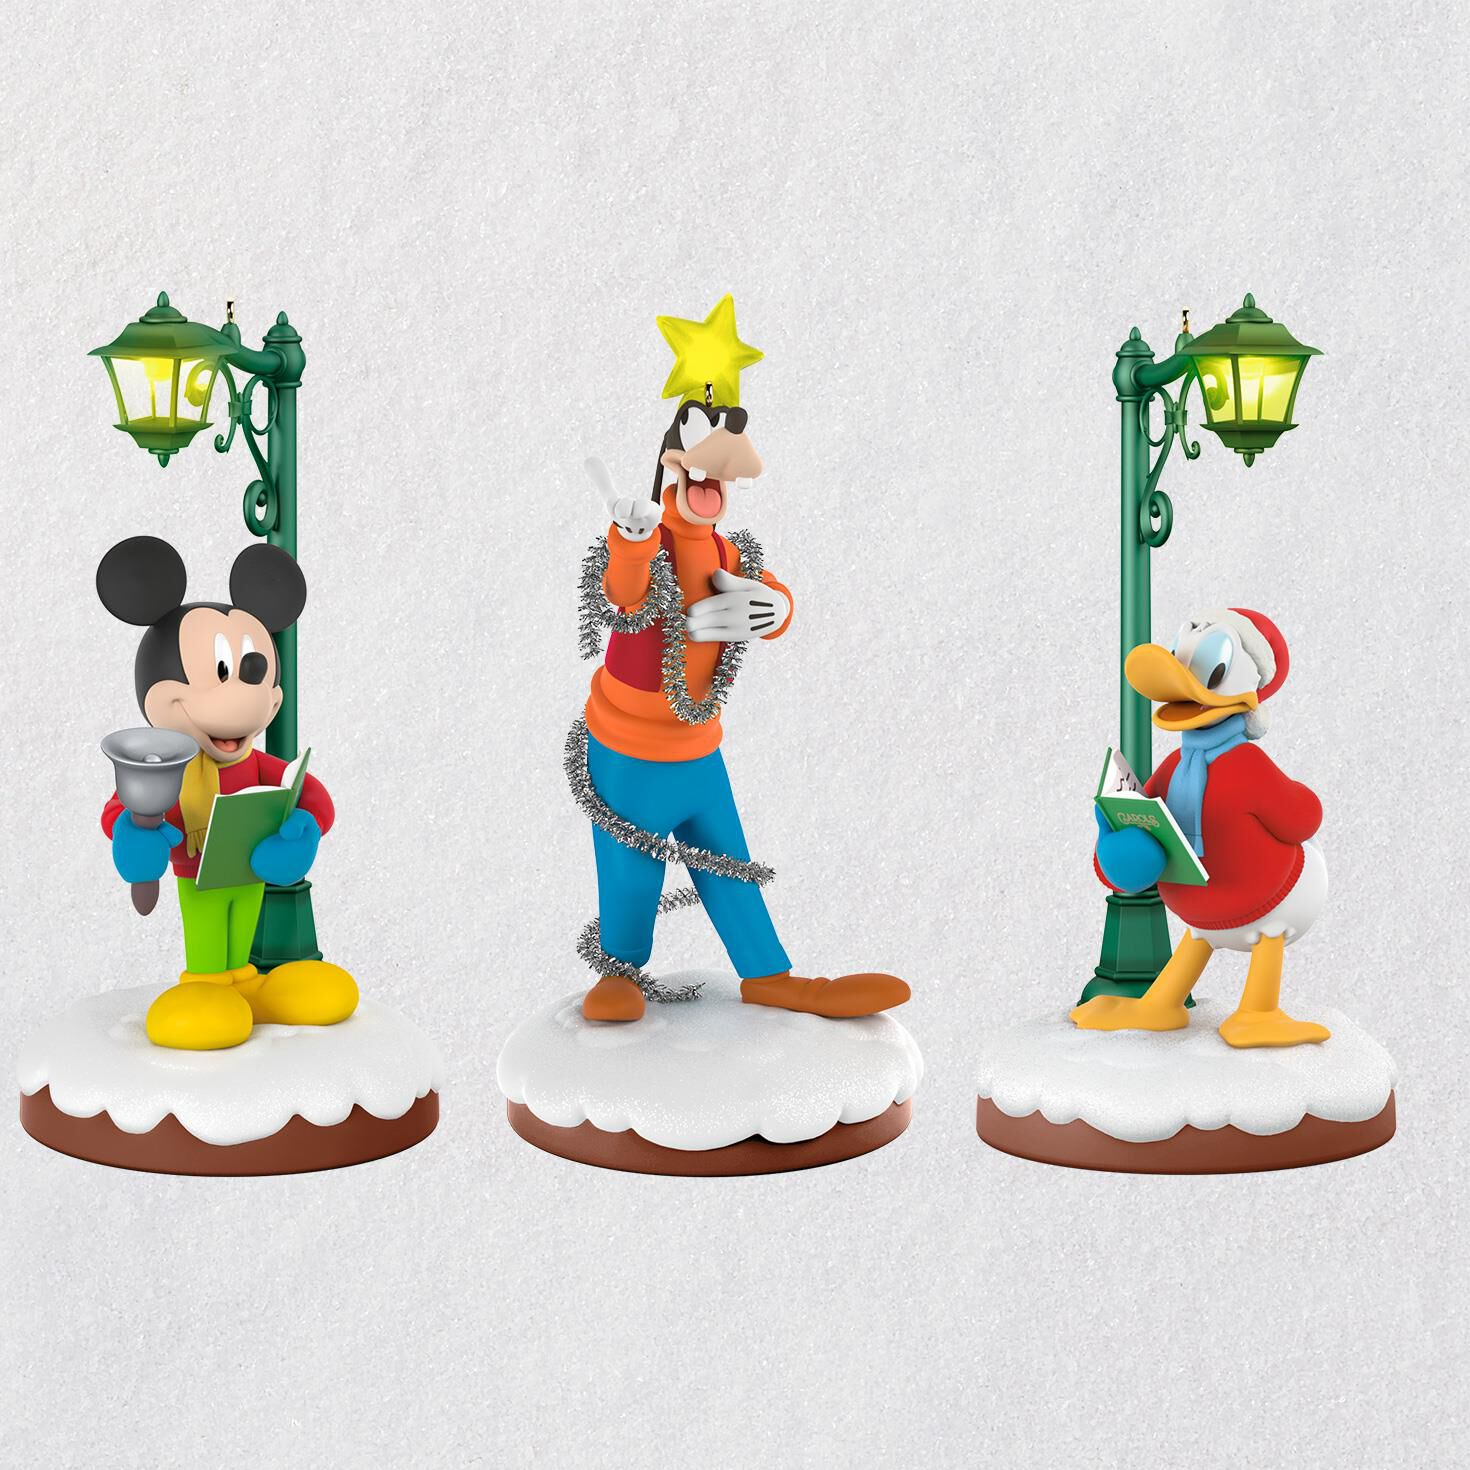 Vintage Christmas Decorations Mouse Carolers Set Jasco: Disney Christmas Cartoon Characters